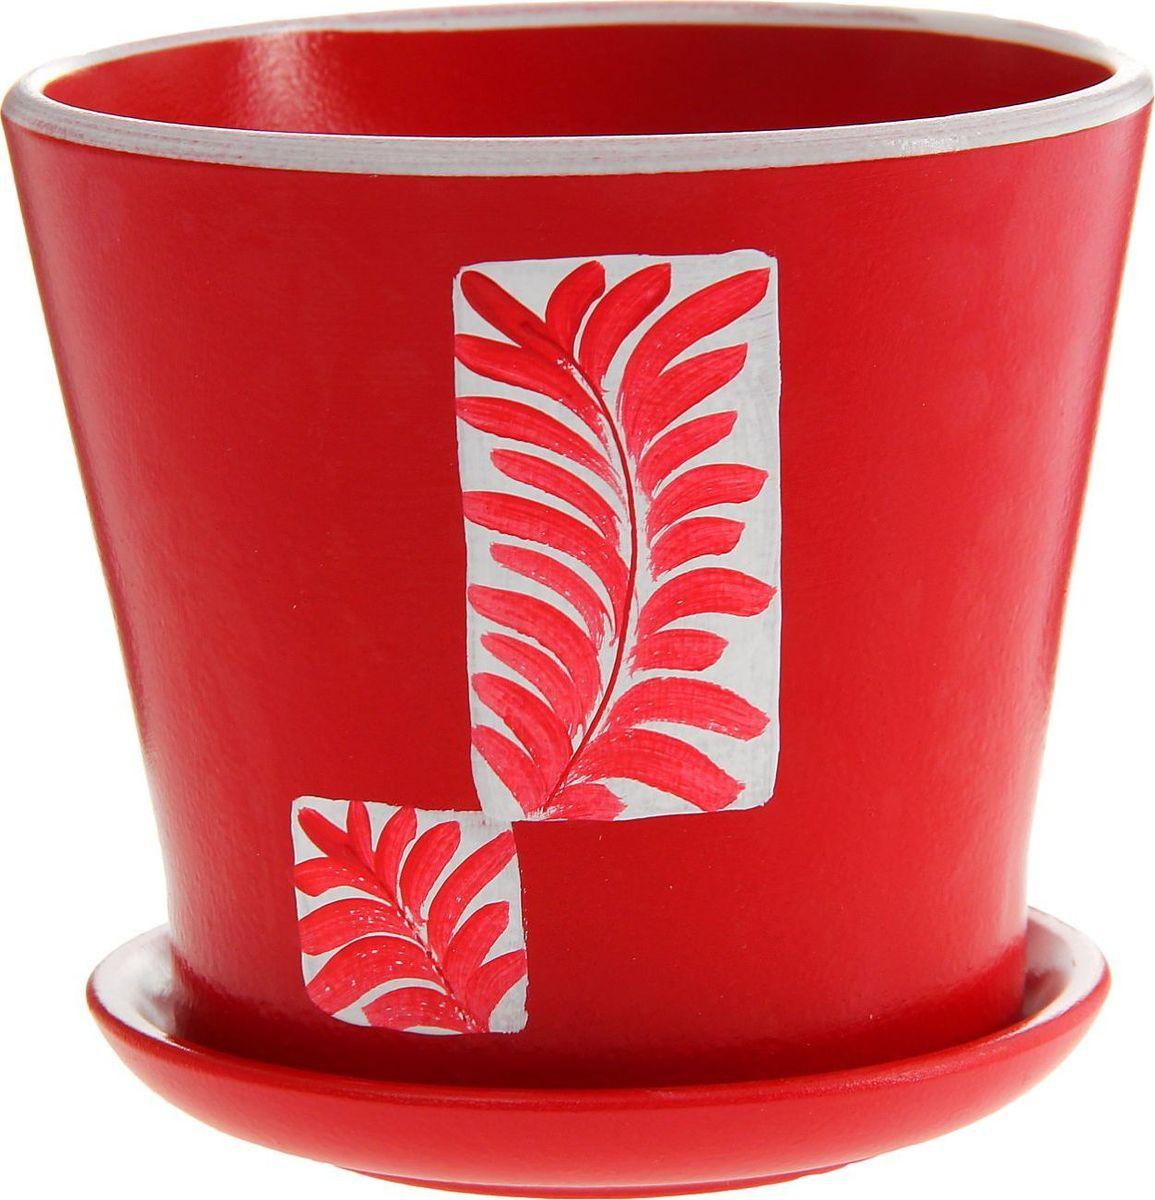 Кашпо Папоротник, цвет: красный, 1 л1157254